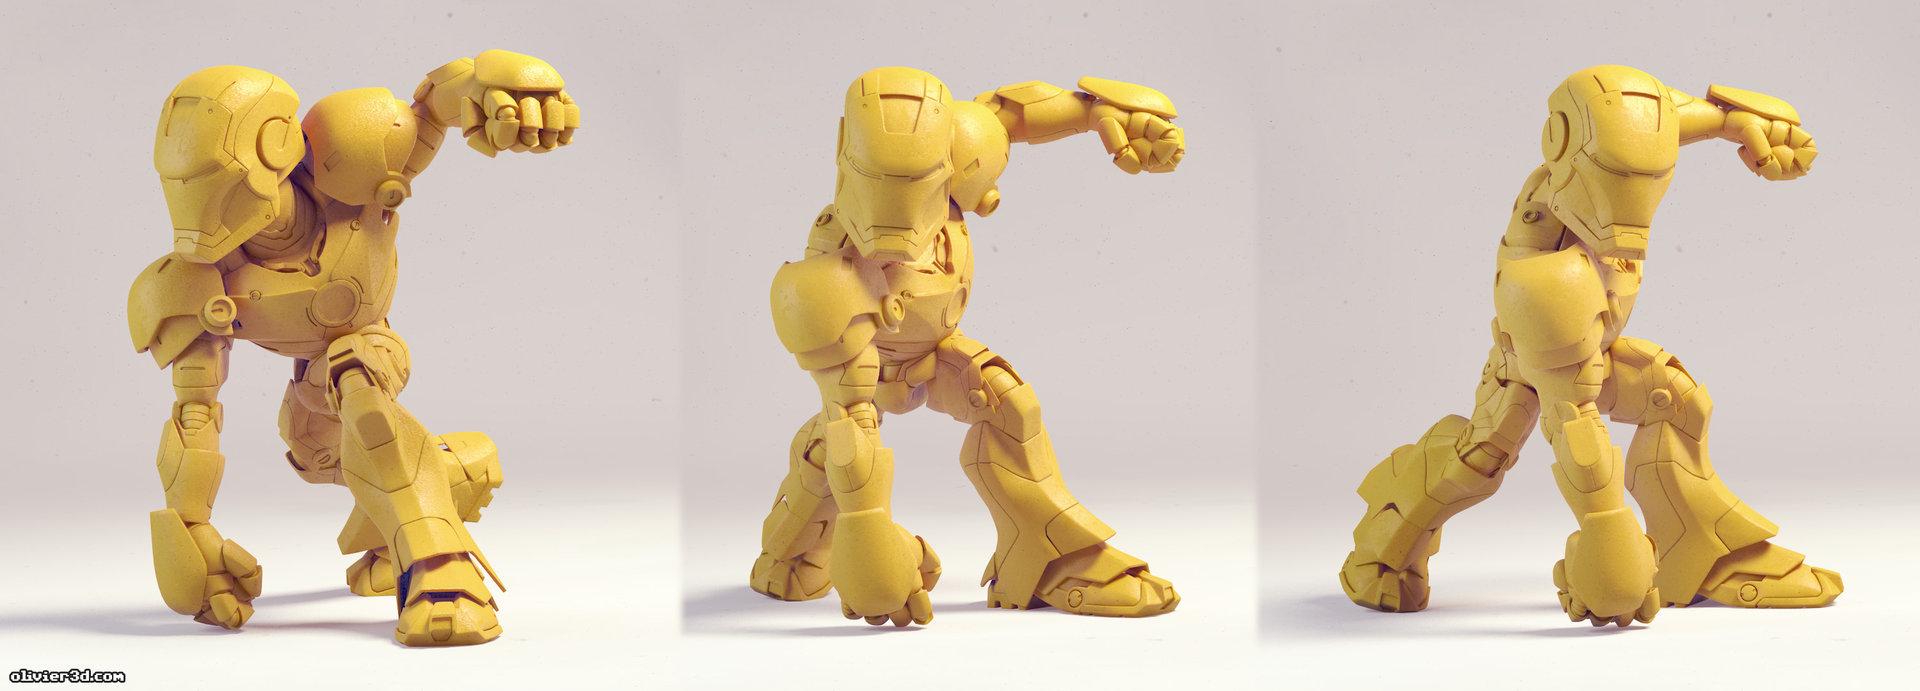 Ironman mk3